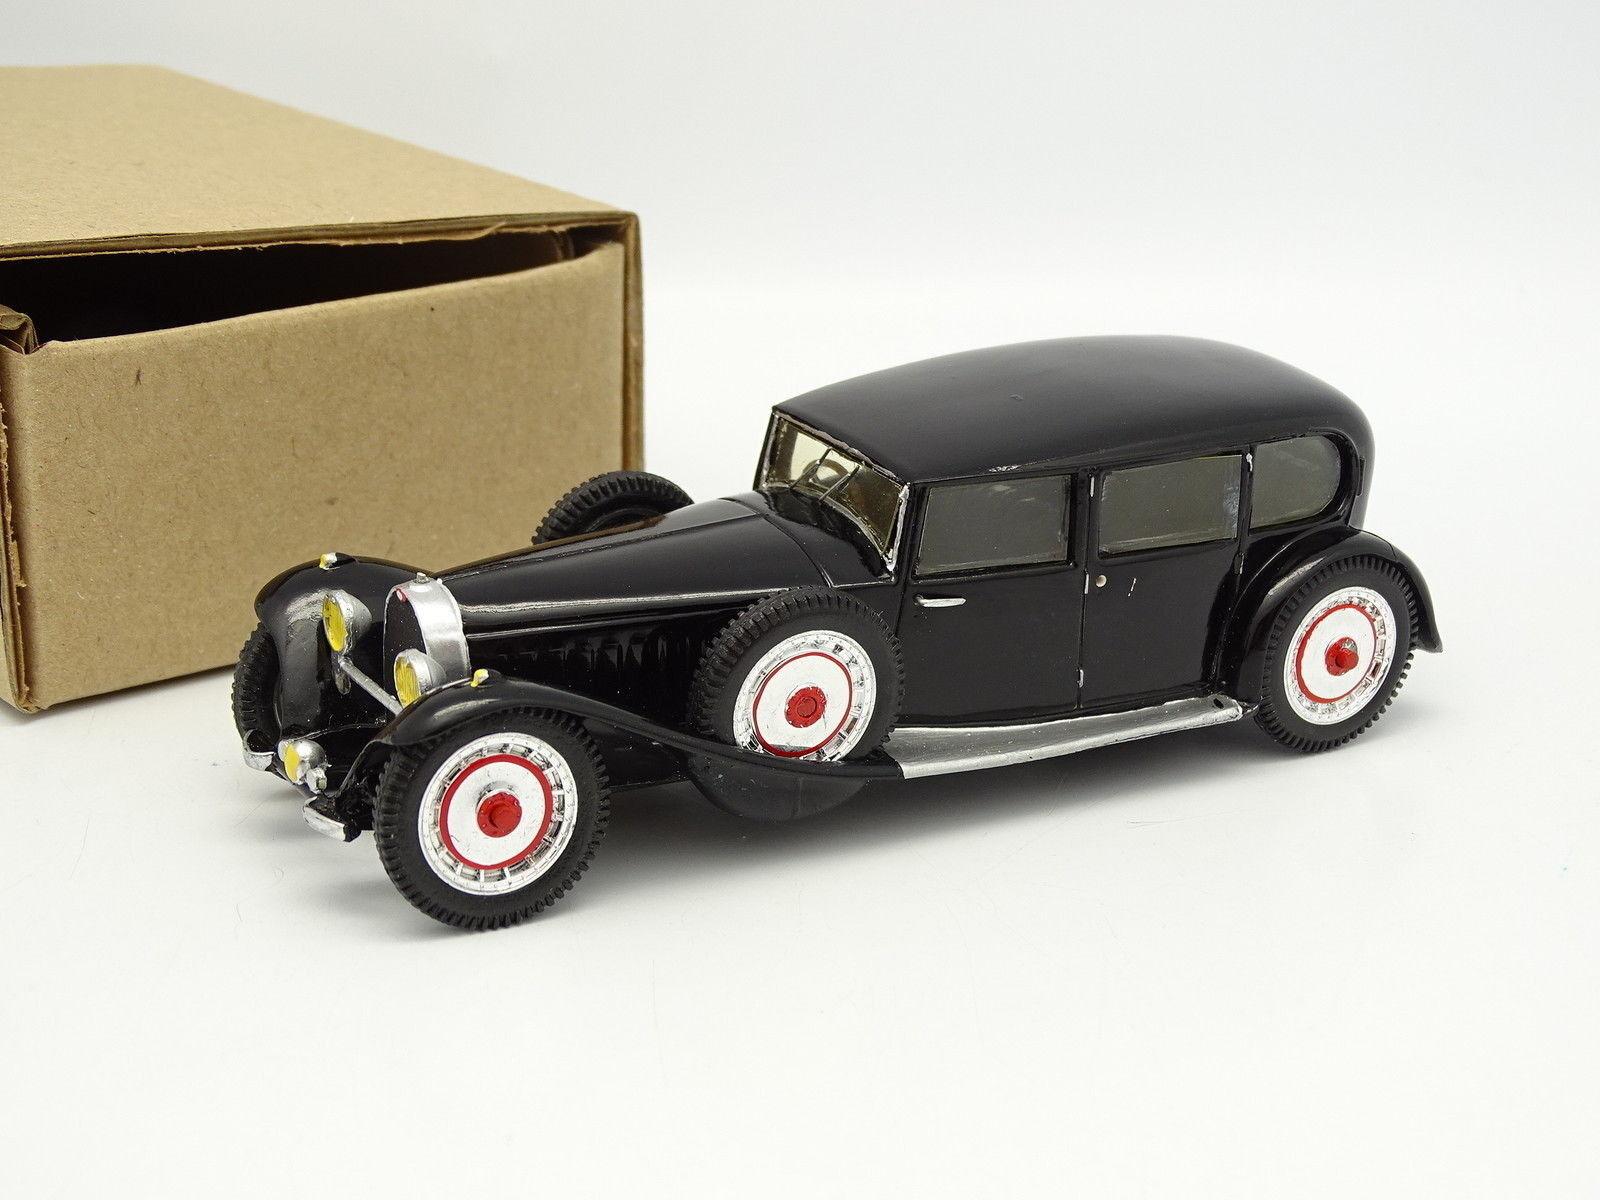 Aurora Modelos Kit Montado 1 43 - Bugatti Real Limusina Parkward 41131 1933